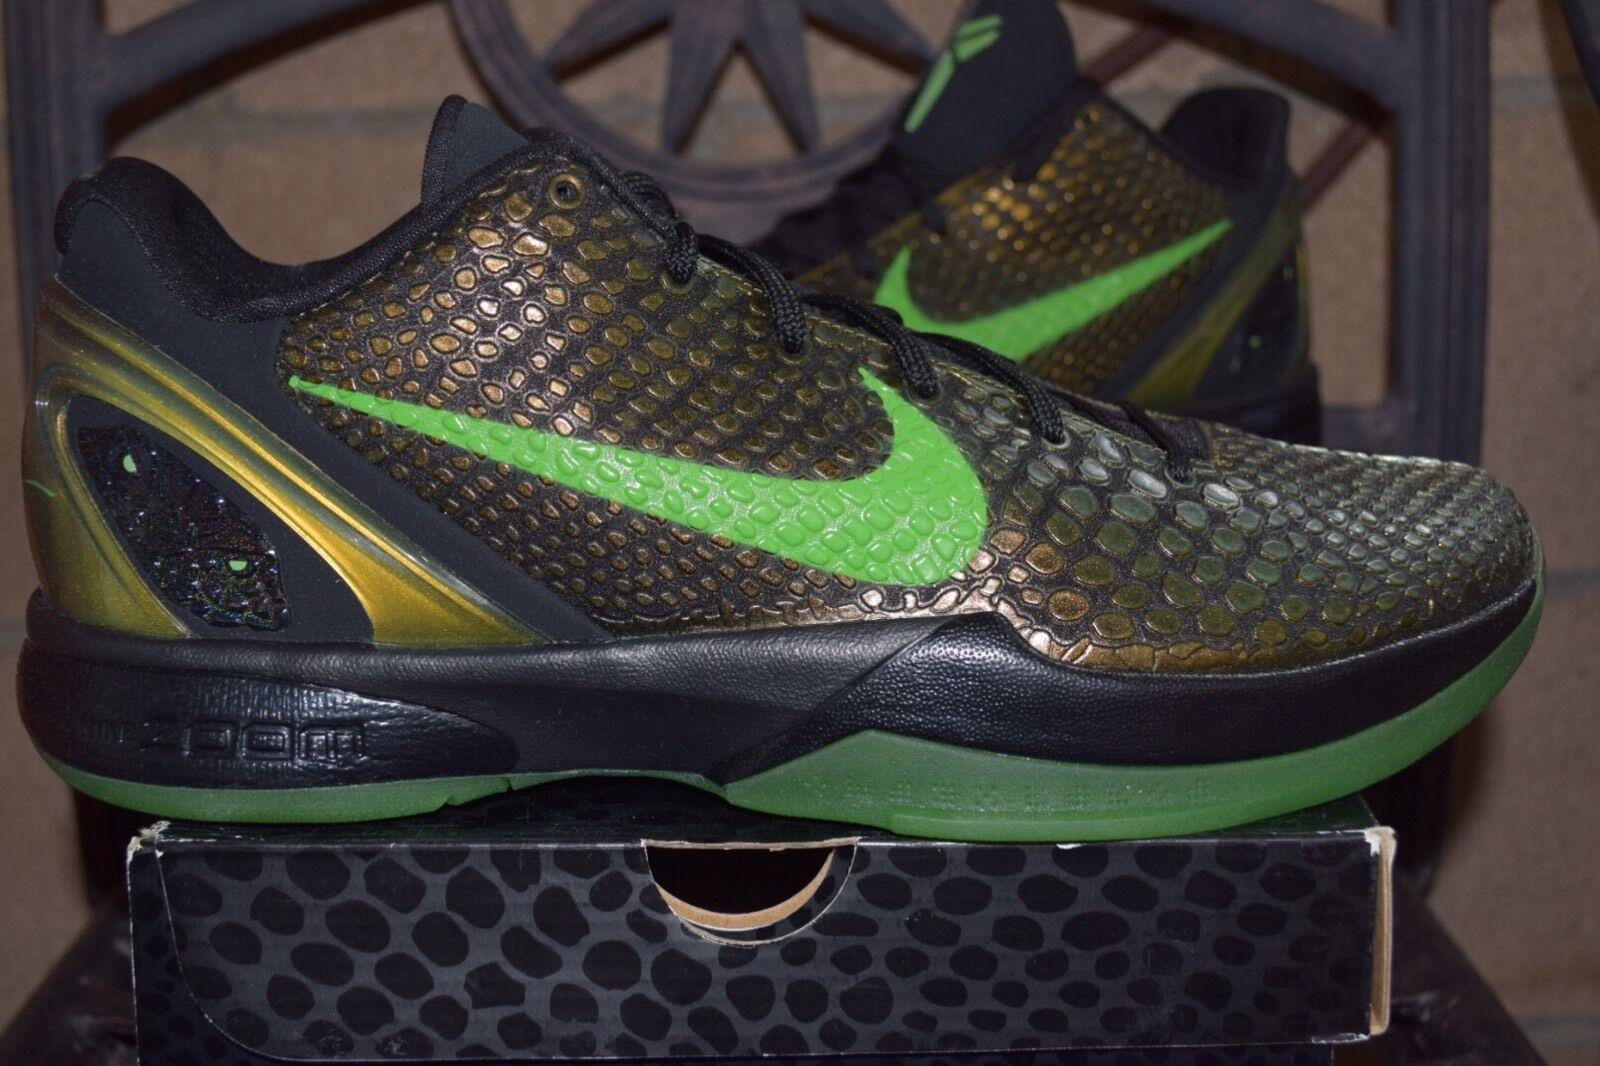 DS 2011 Nike Zoom Kobe VI Tagged 6 Rice H.S. Promo Tagged VI 999999 Size 13 36345f